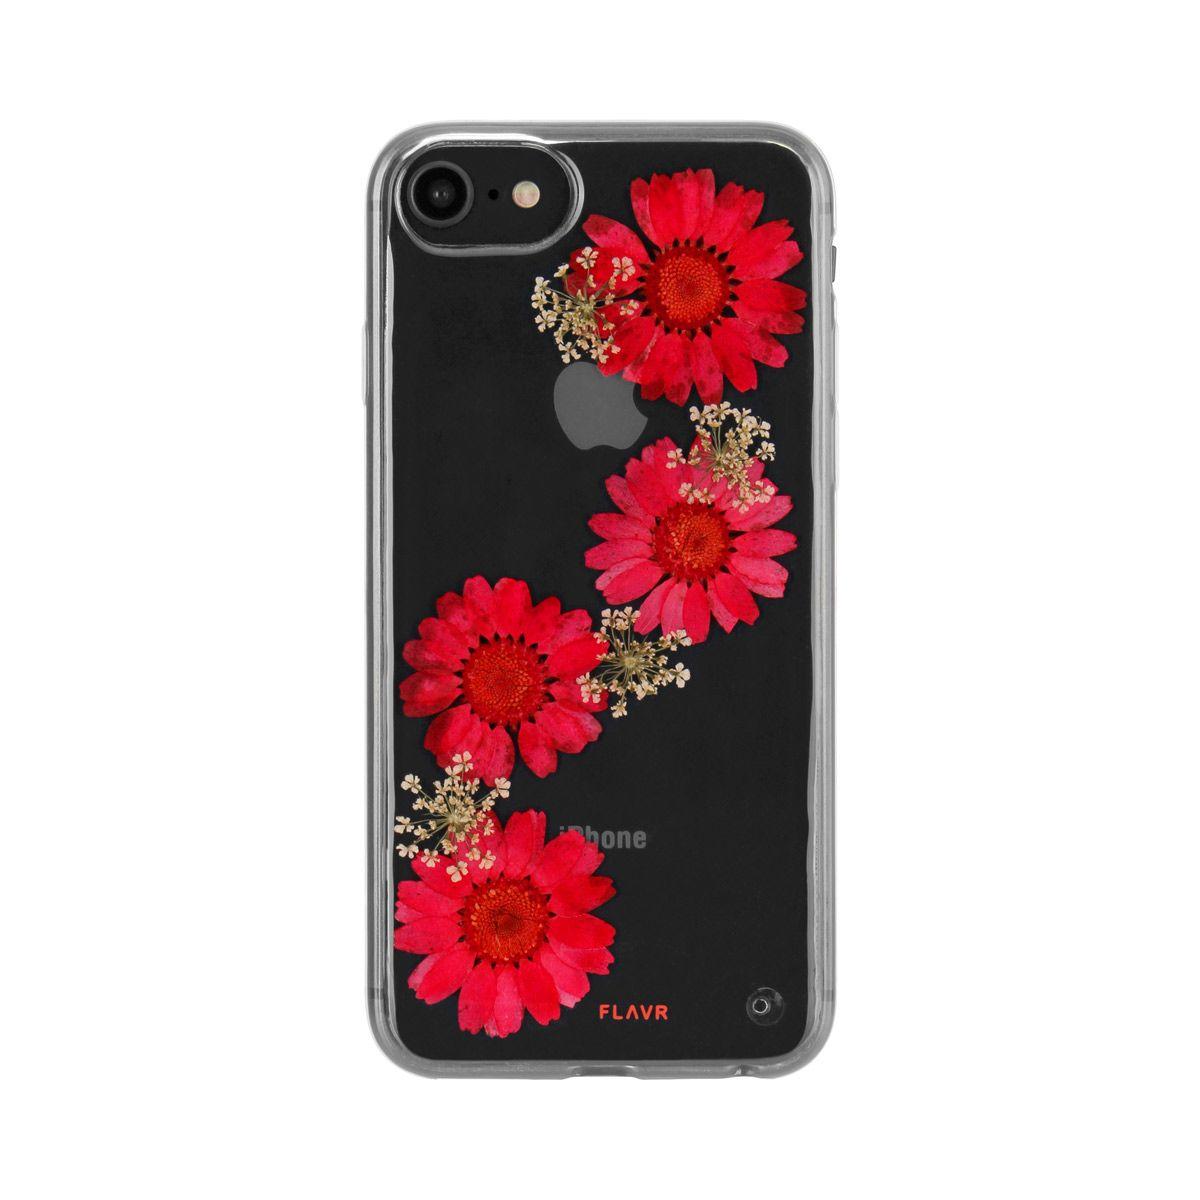 Ochranný kryt pro iPhone 8 / 7 / 6s / 6 - FLAVR, REAL FLOWER PAULA